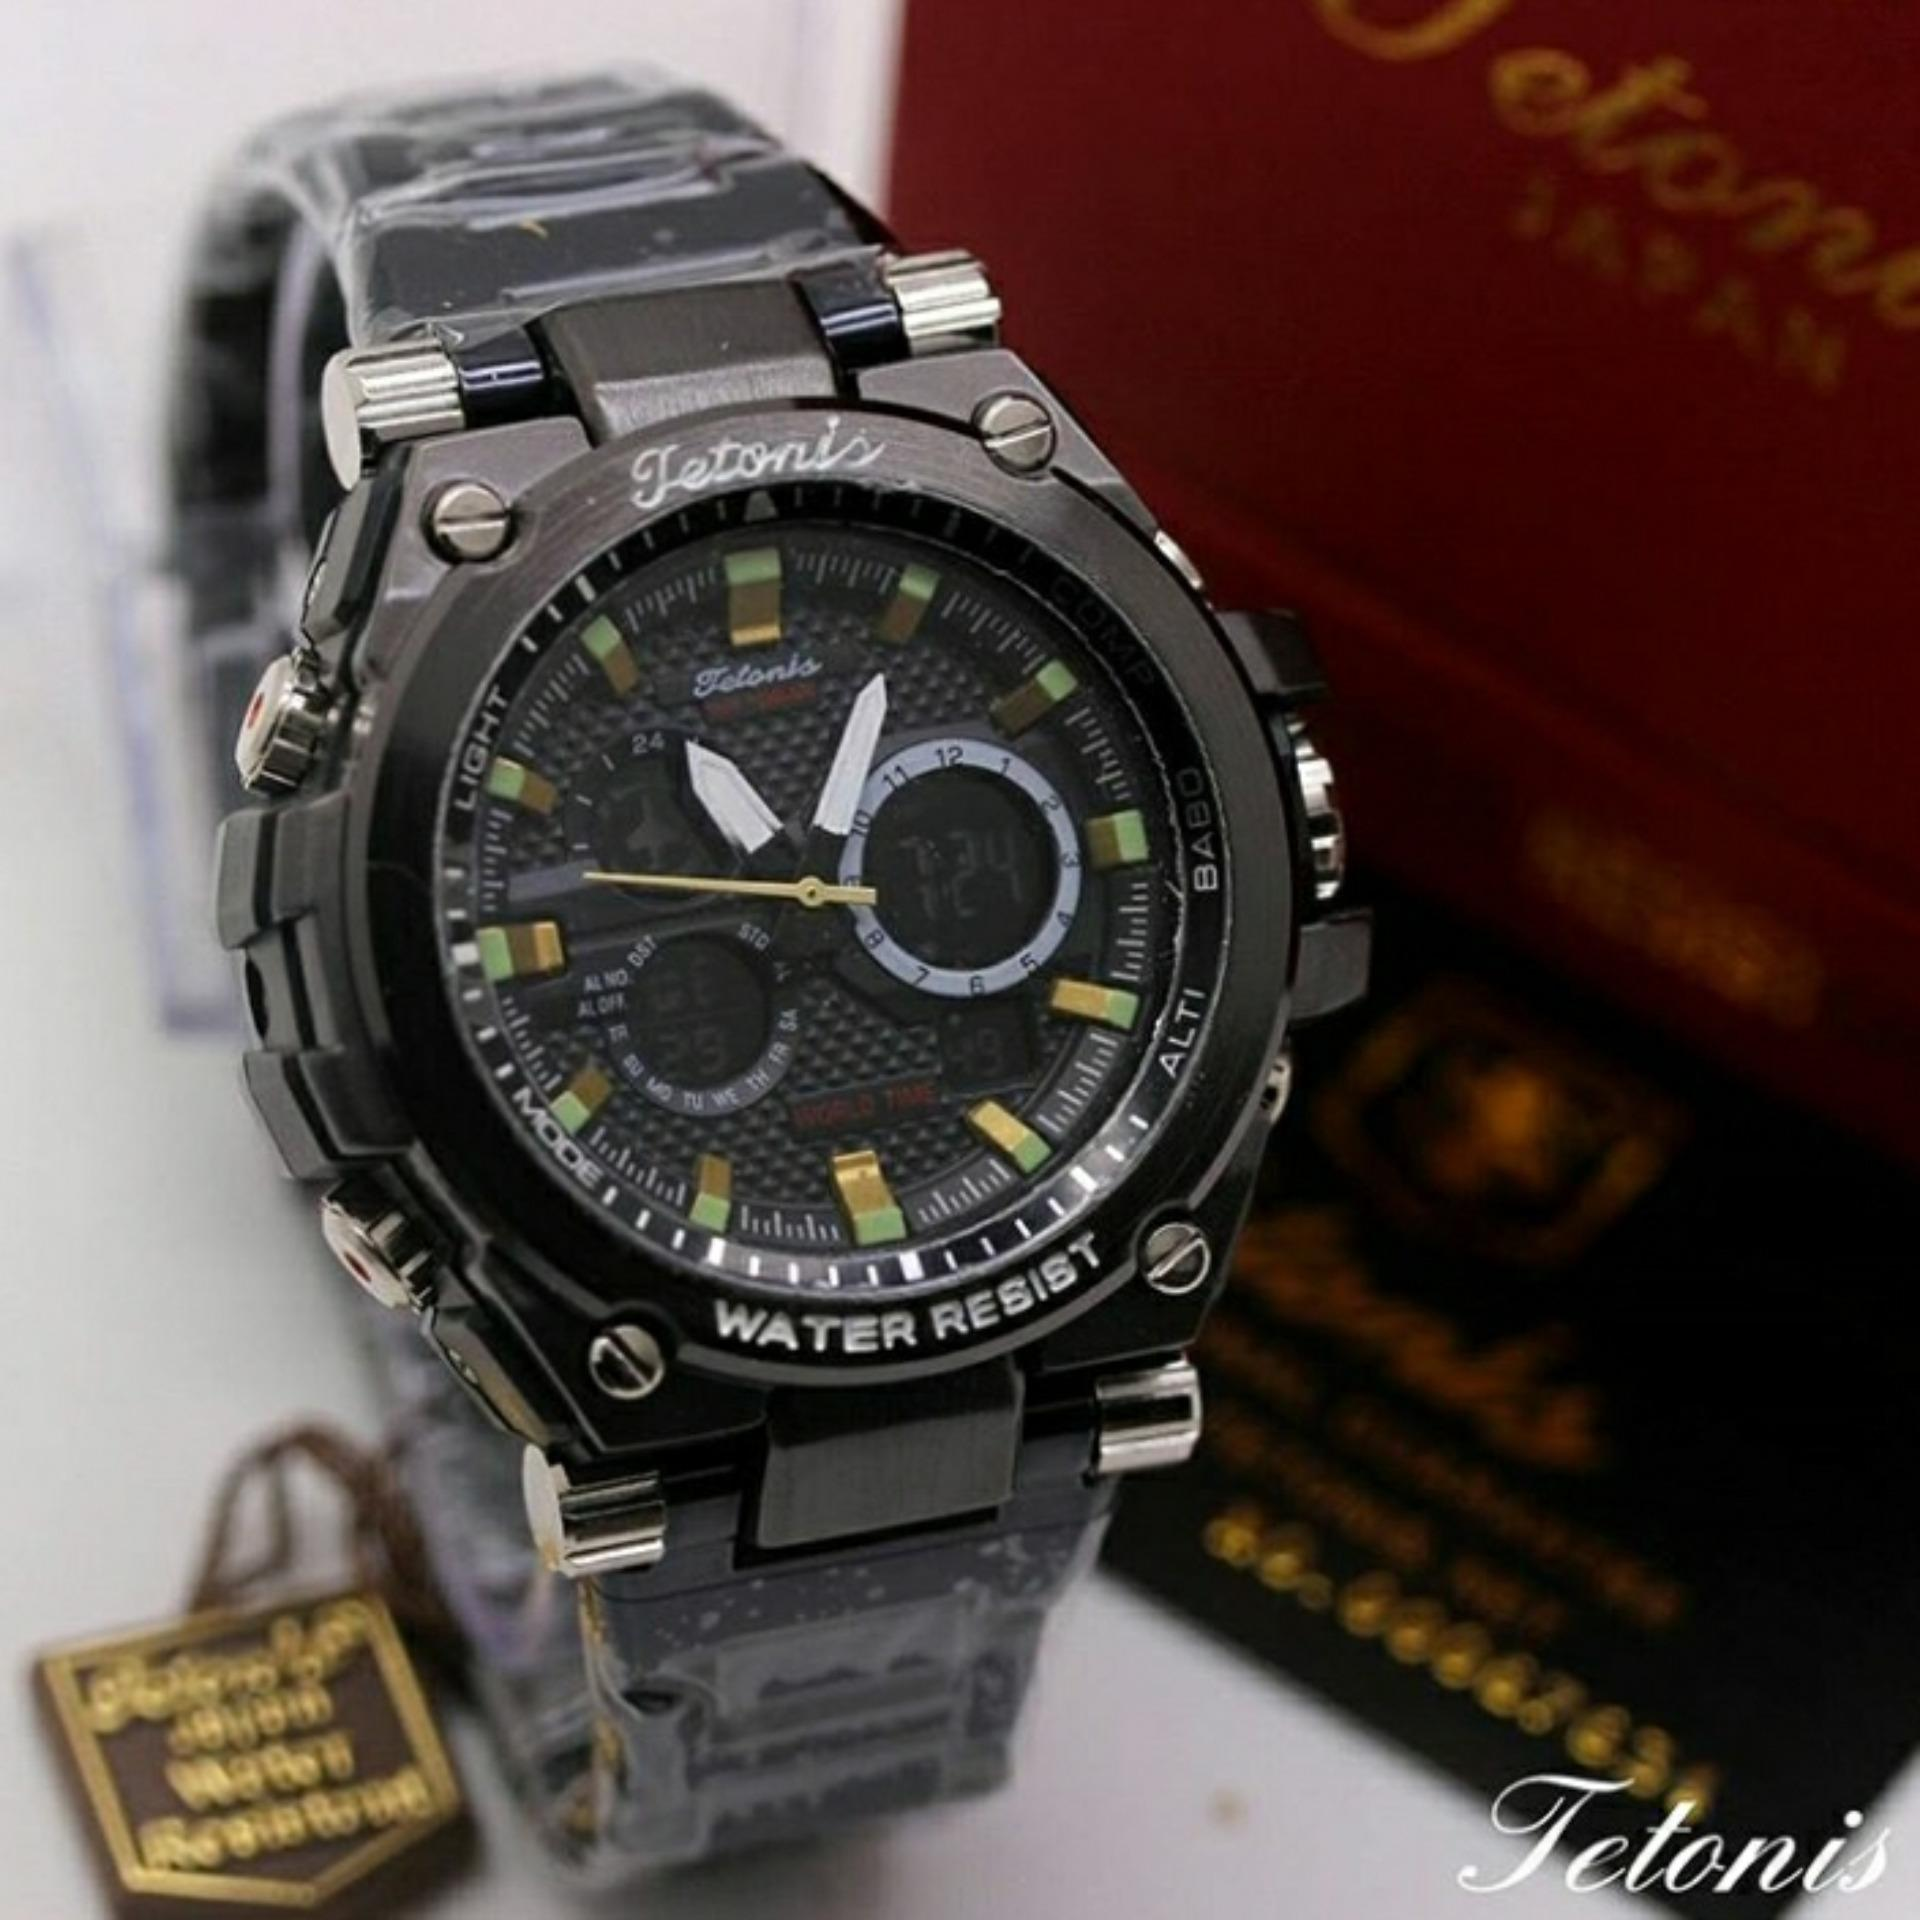 Diskon Tetonis Dual Time Jam Tangan Fashion Pria Stainlees Strap Ts4508 Tetonis Di Dki Jakarta